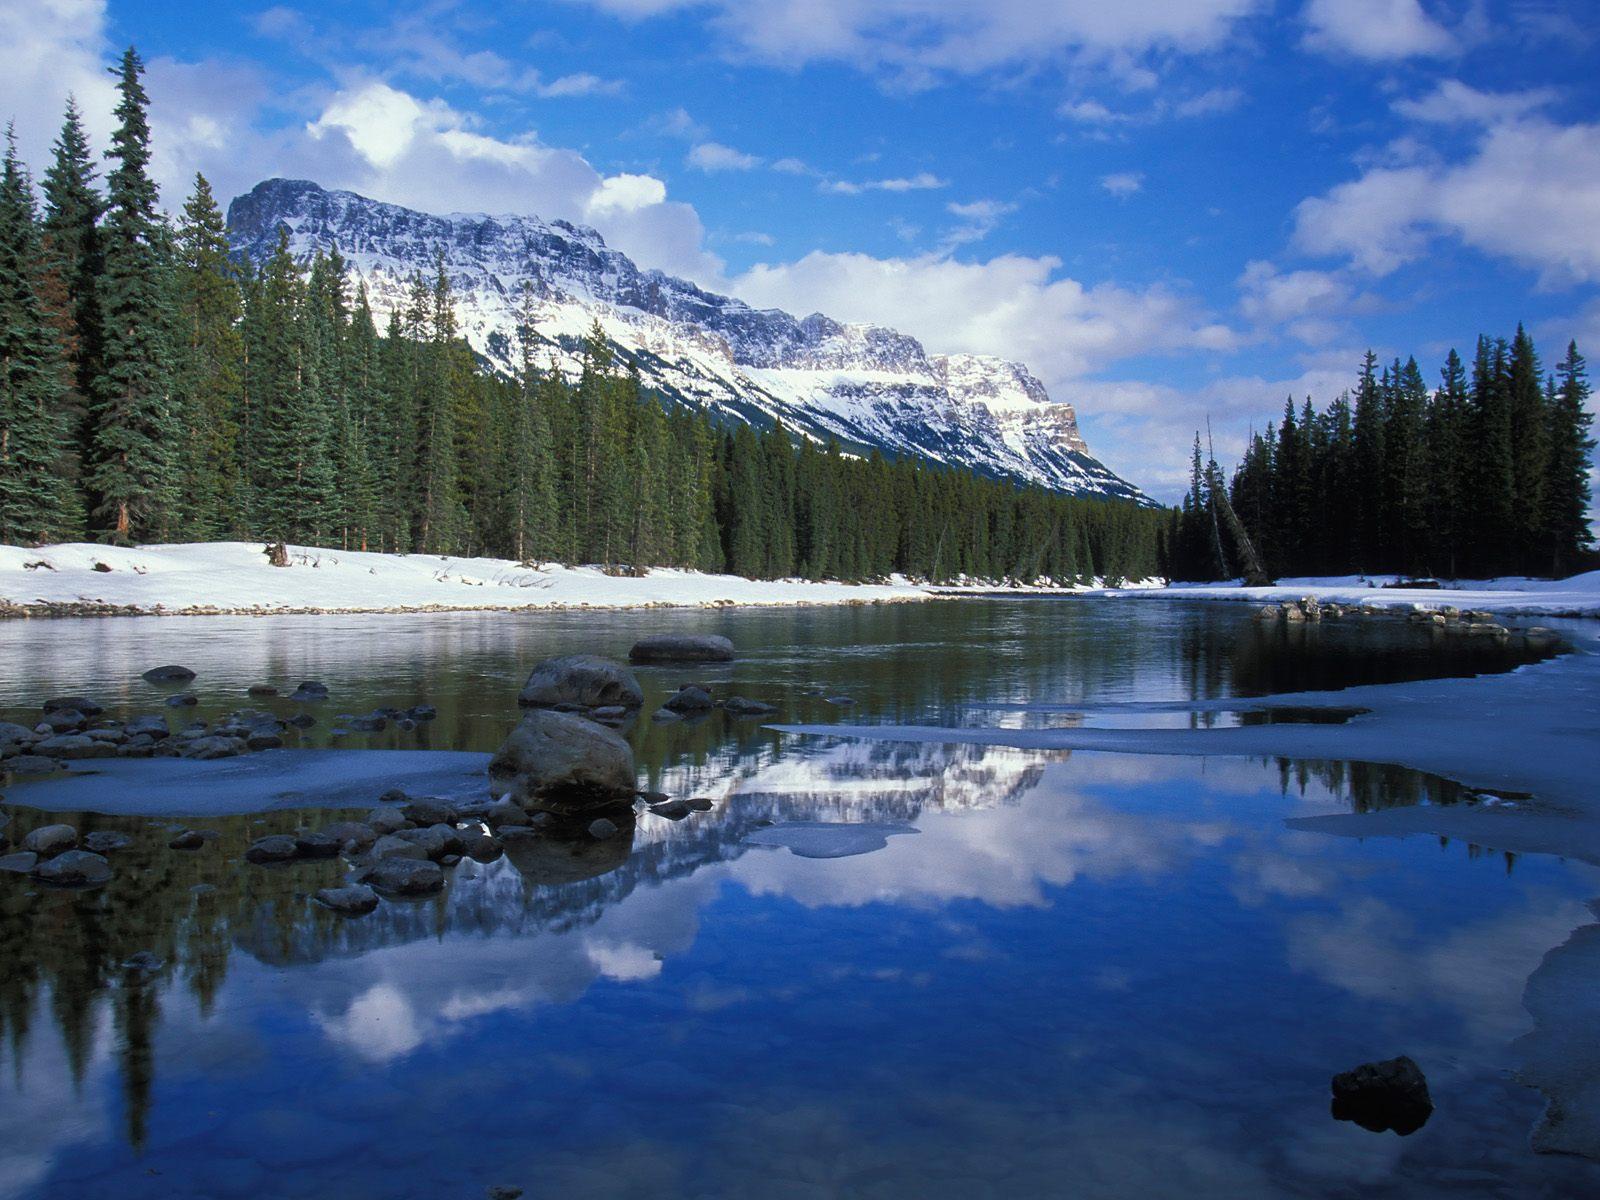 Canada photo Bow River and Castle Mountain Alberta Canada wallpaper 1600x1200